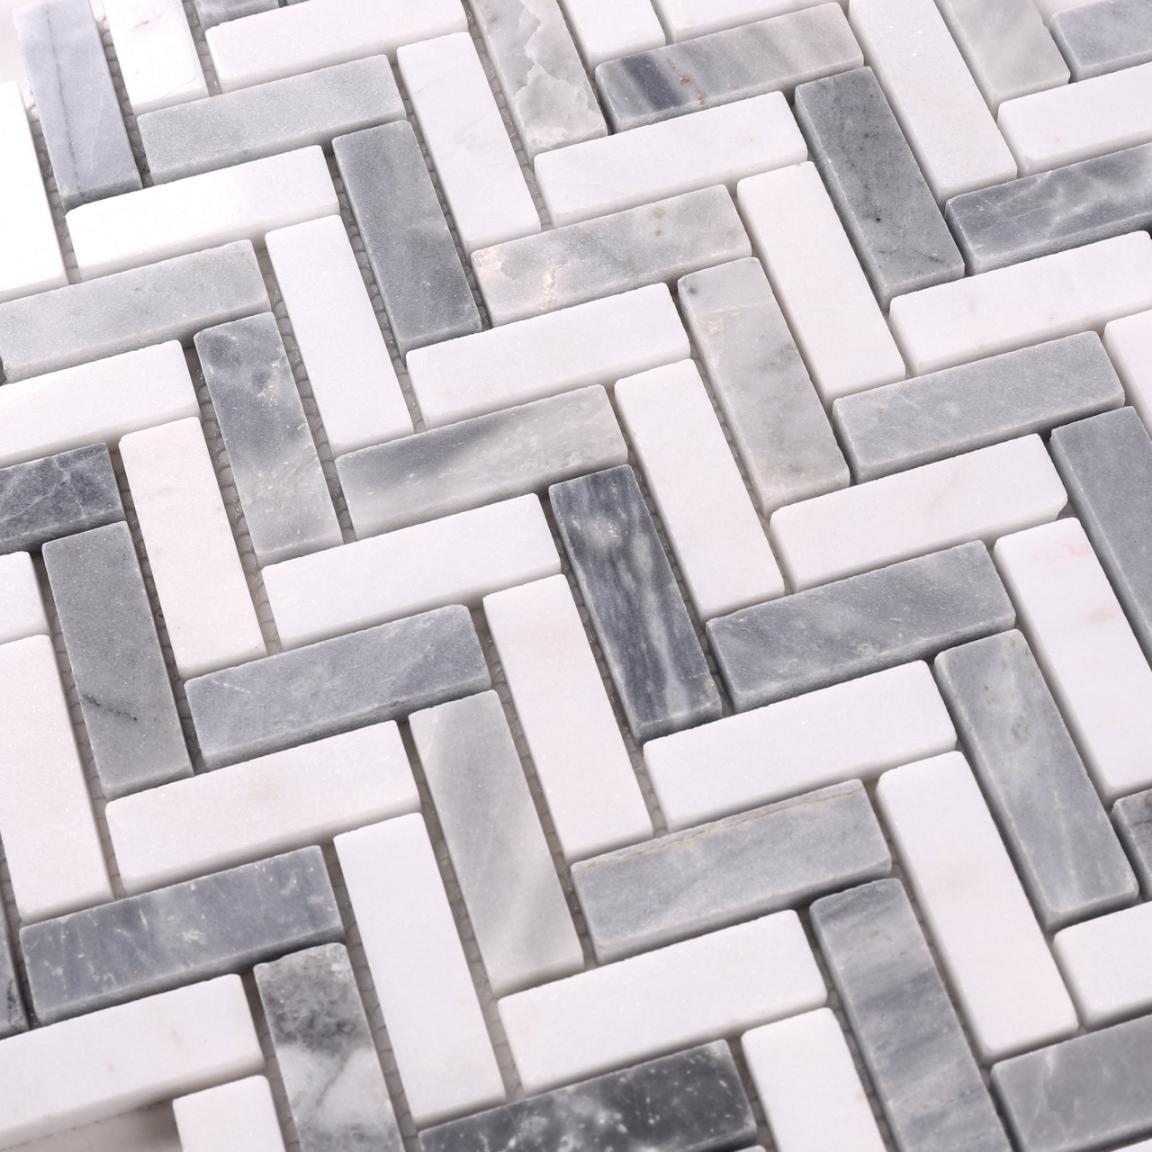 2019 Popular Herringbone Marble Mosaic Tile for Floor HSC148